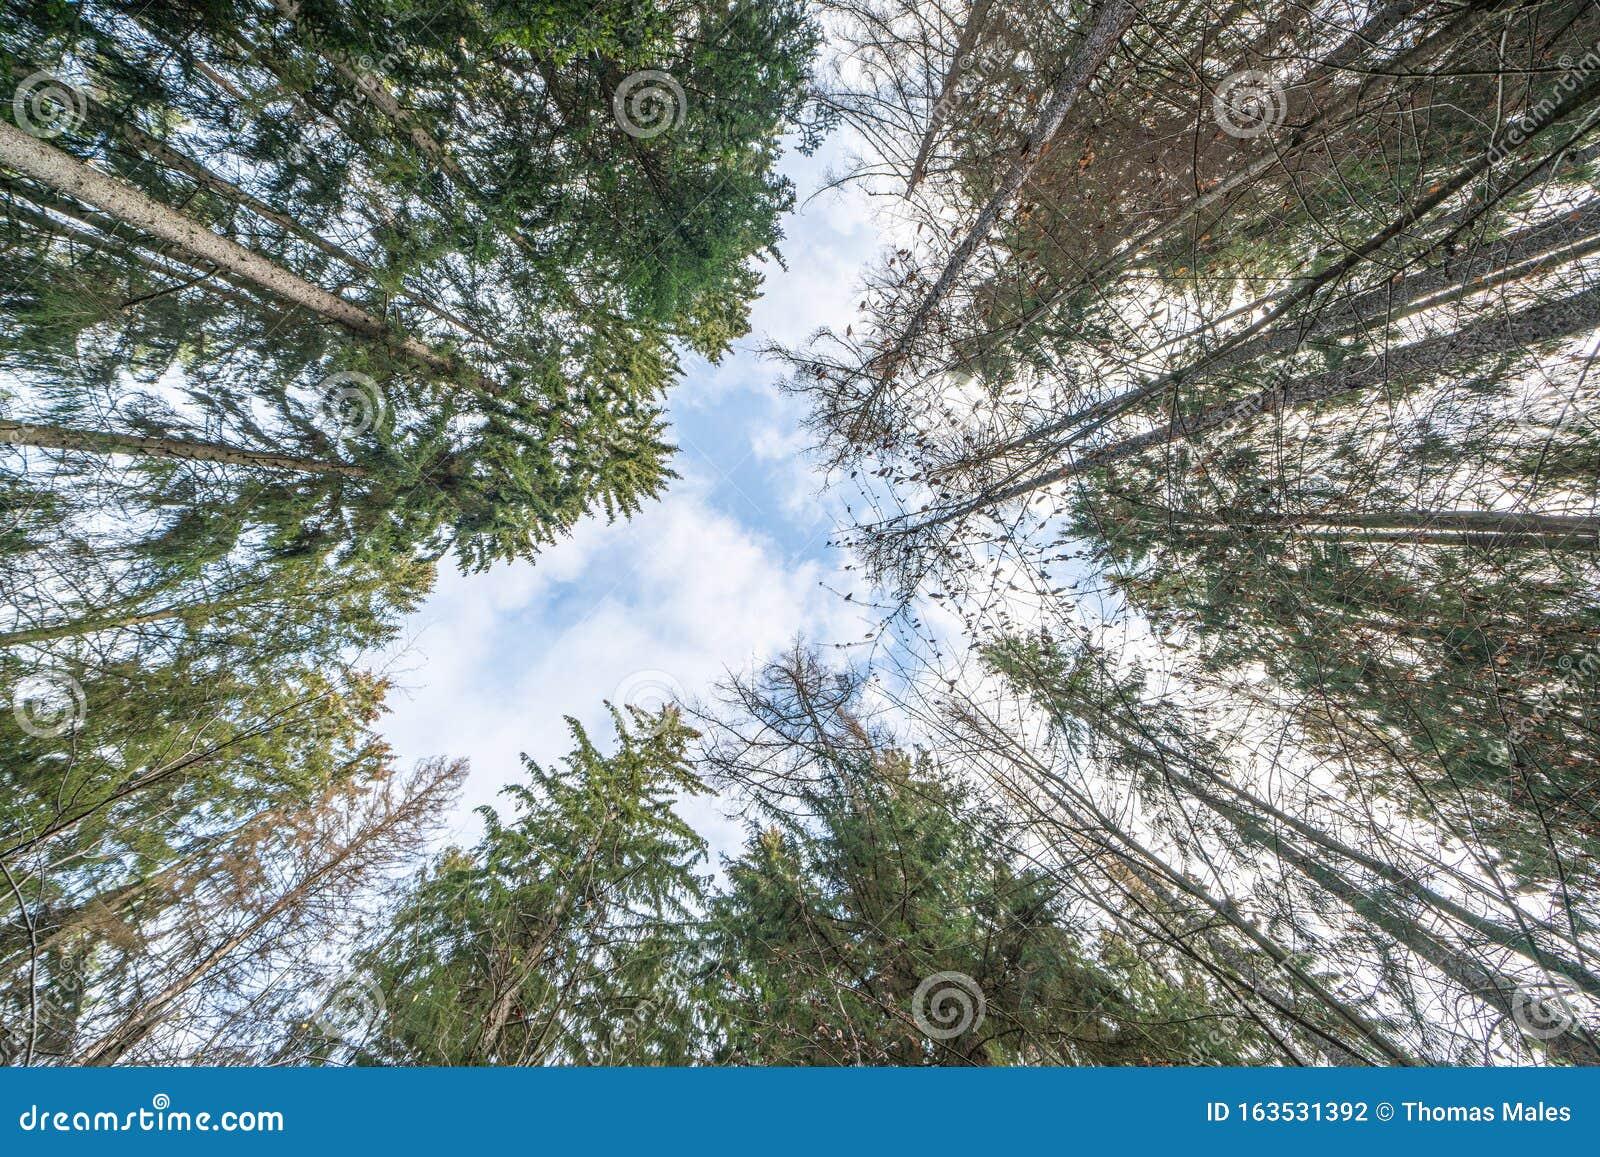 Omberg Ekopark And Nature Reserve Stock Photo Image Of Fresh Ostergotland 163531392